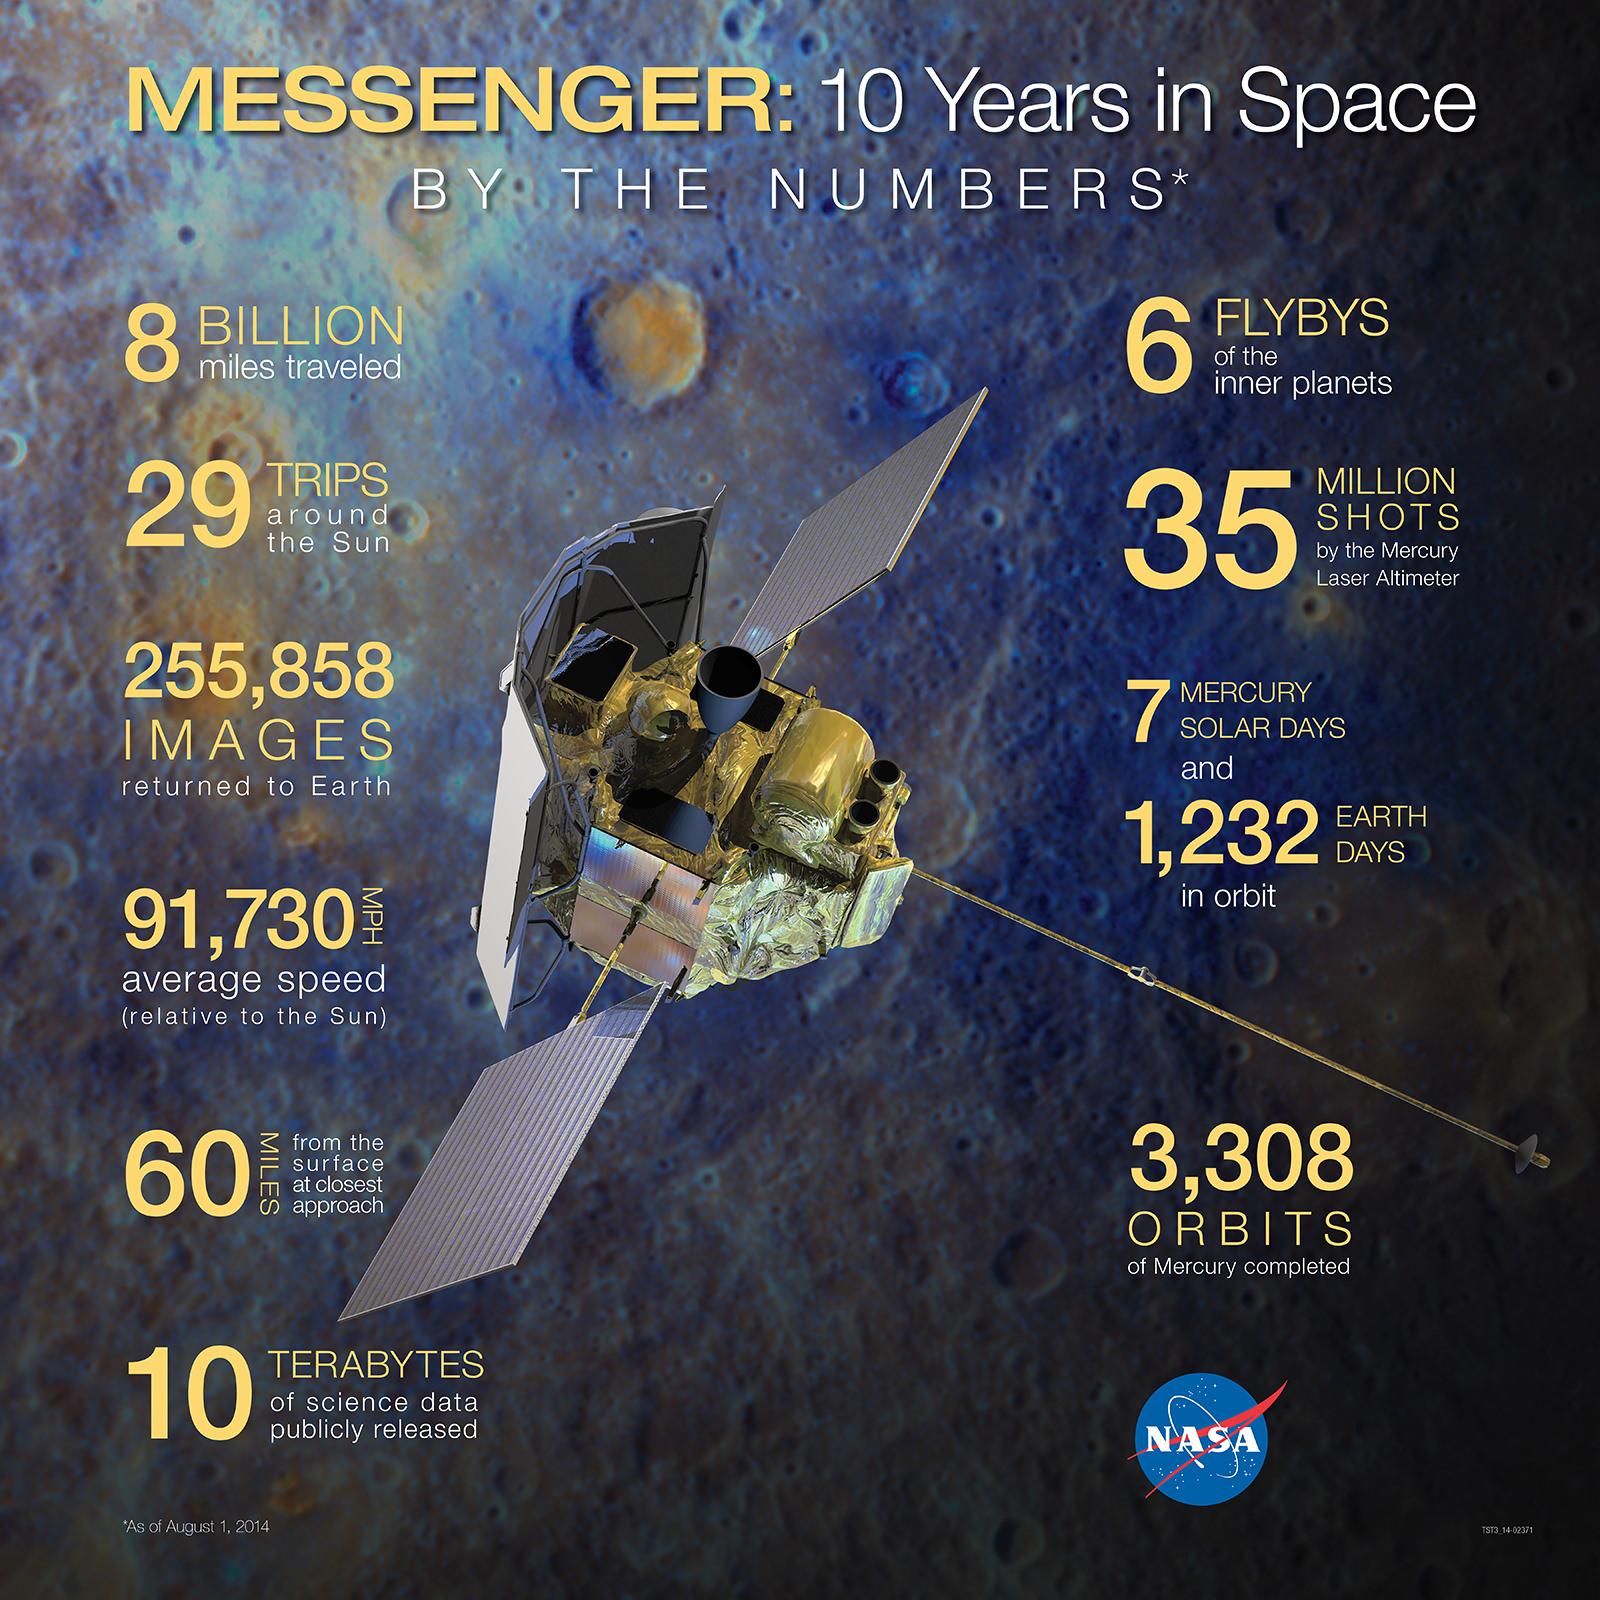 MESSENGER Completes Second Burn to Maintain Mercury Orbit